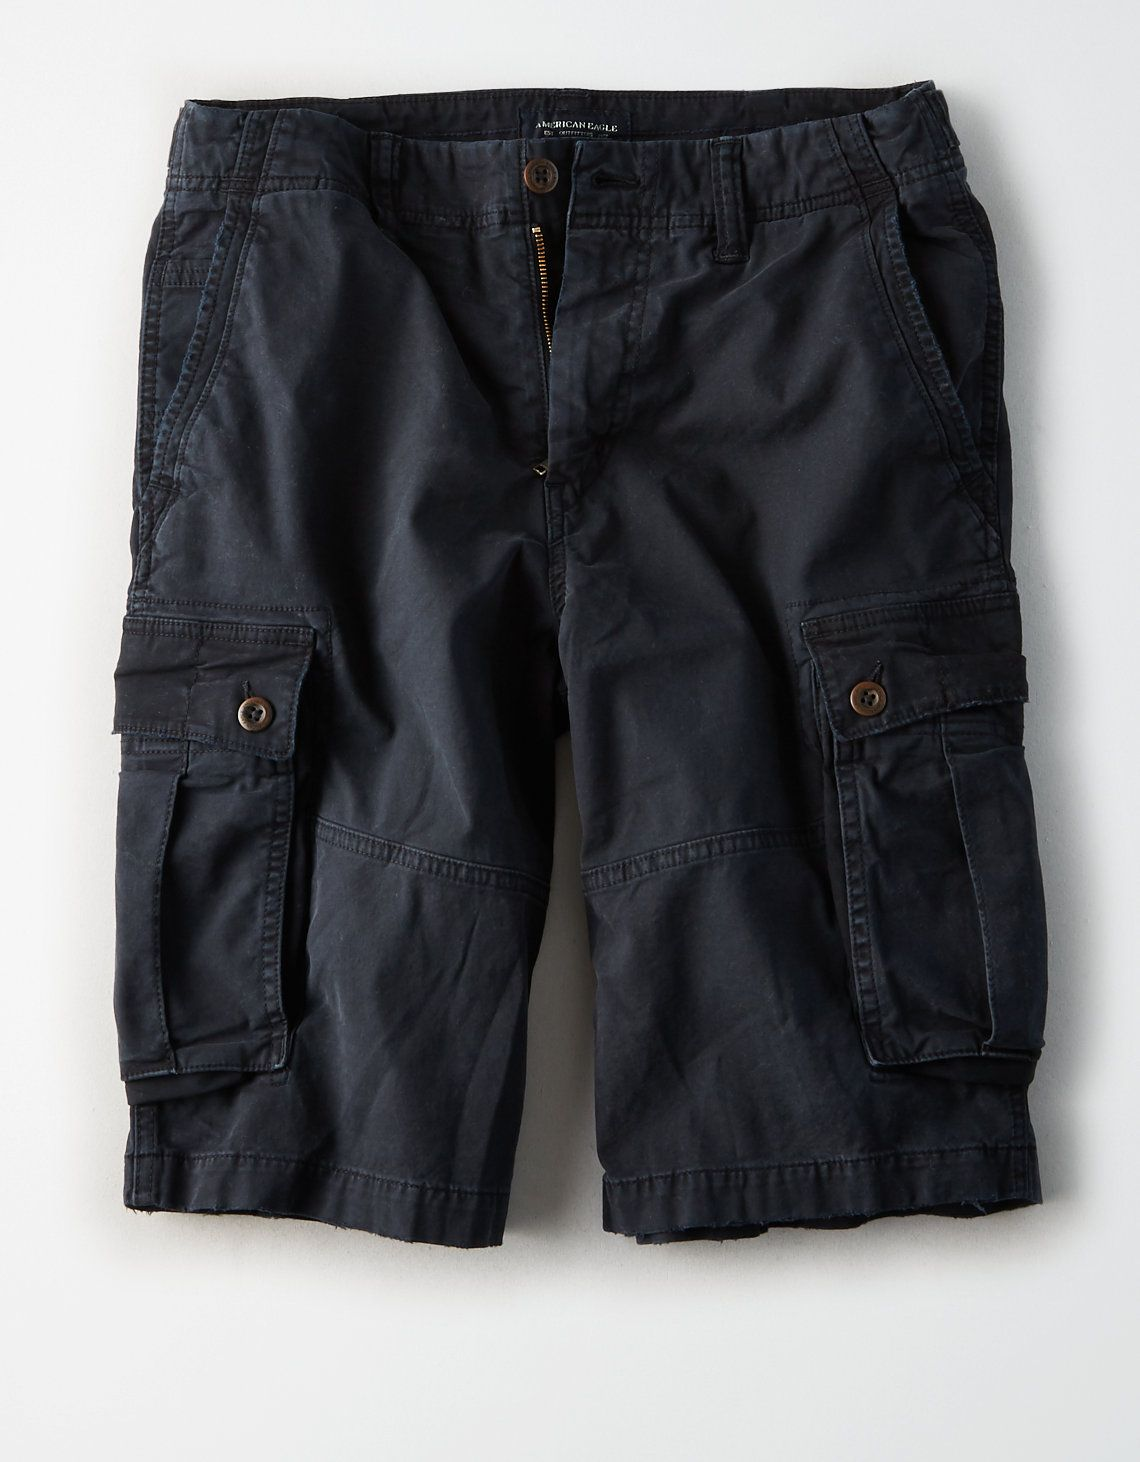 Ae Flex Longer Length Cargo Short Cargo Shorts Cargo Shorts Women Mens Dress Shorts [ 1462 x 1140 Pixel ]